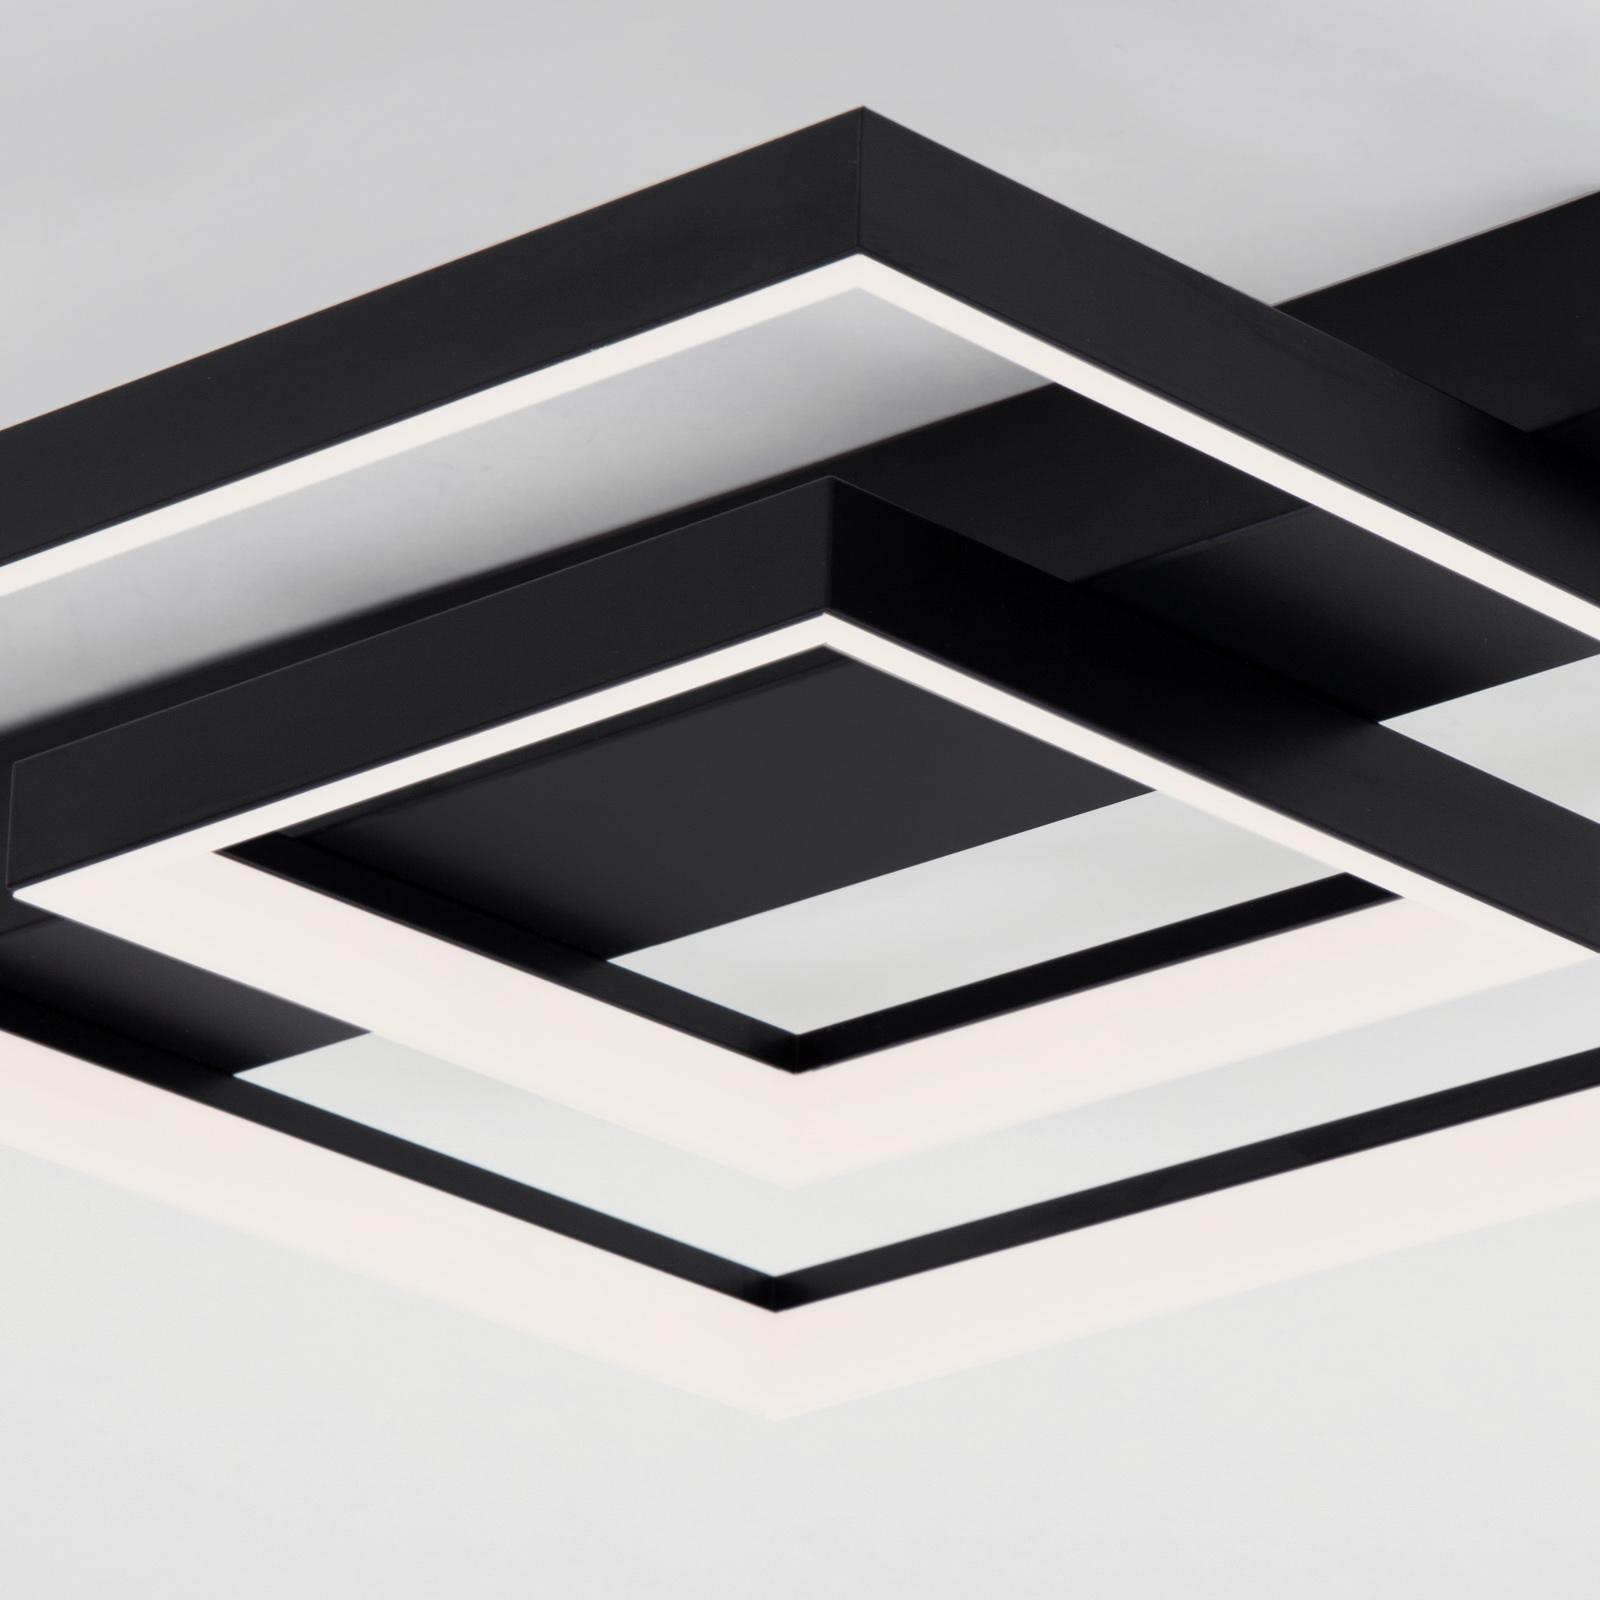 LED plafondlamp 3027, hoekig, zwart, 2 profielen